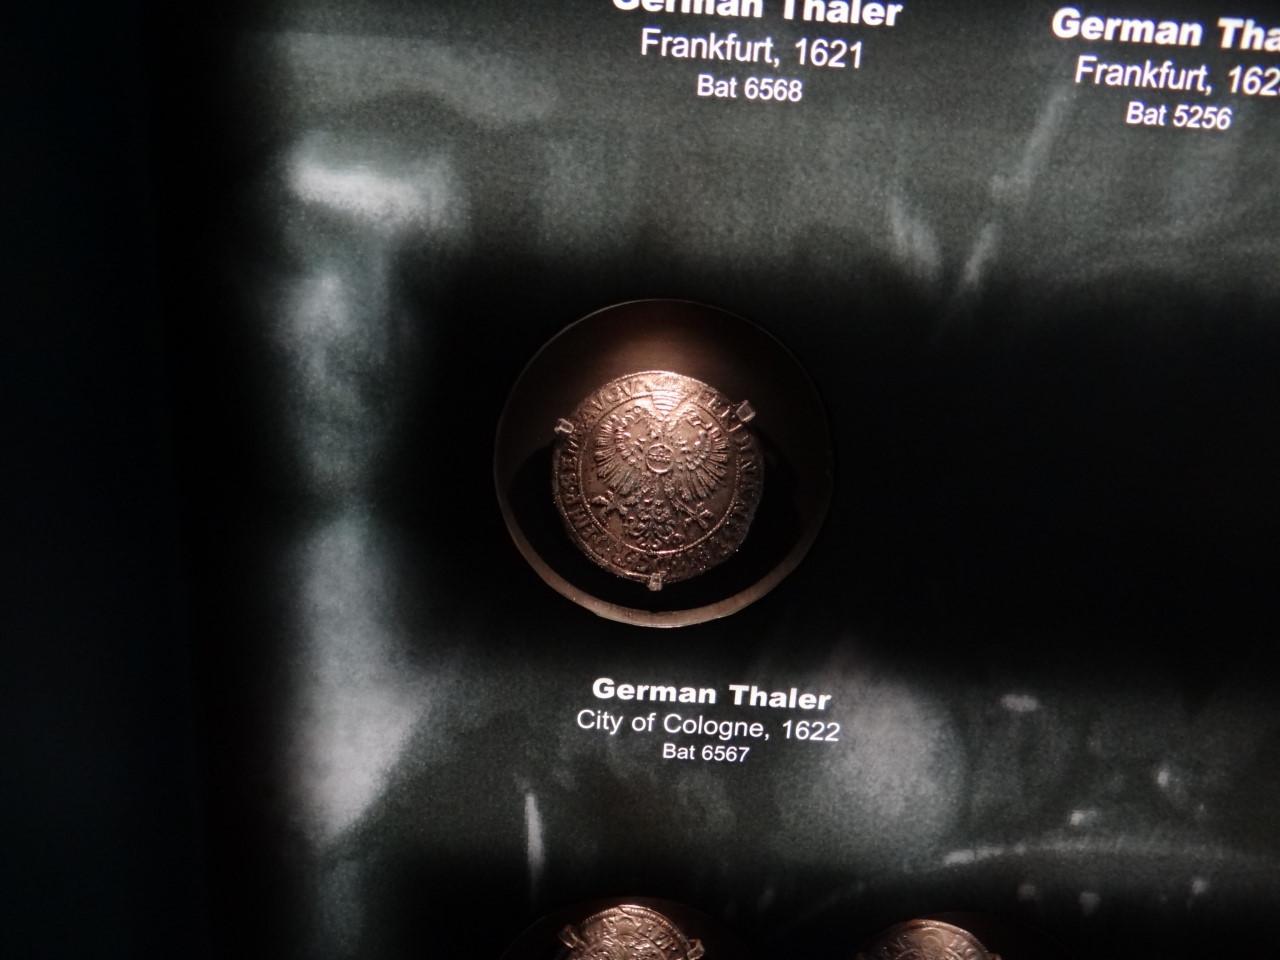 Kölle!!! German Taler, Geraldton Museum